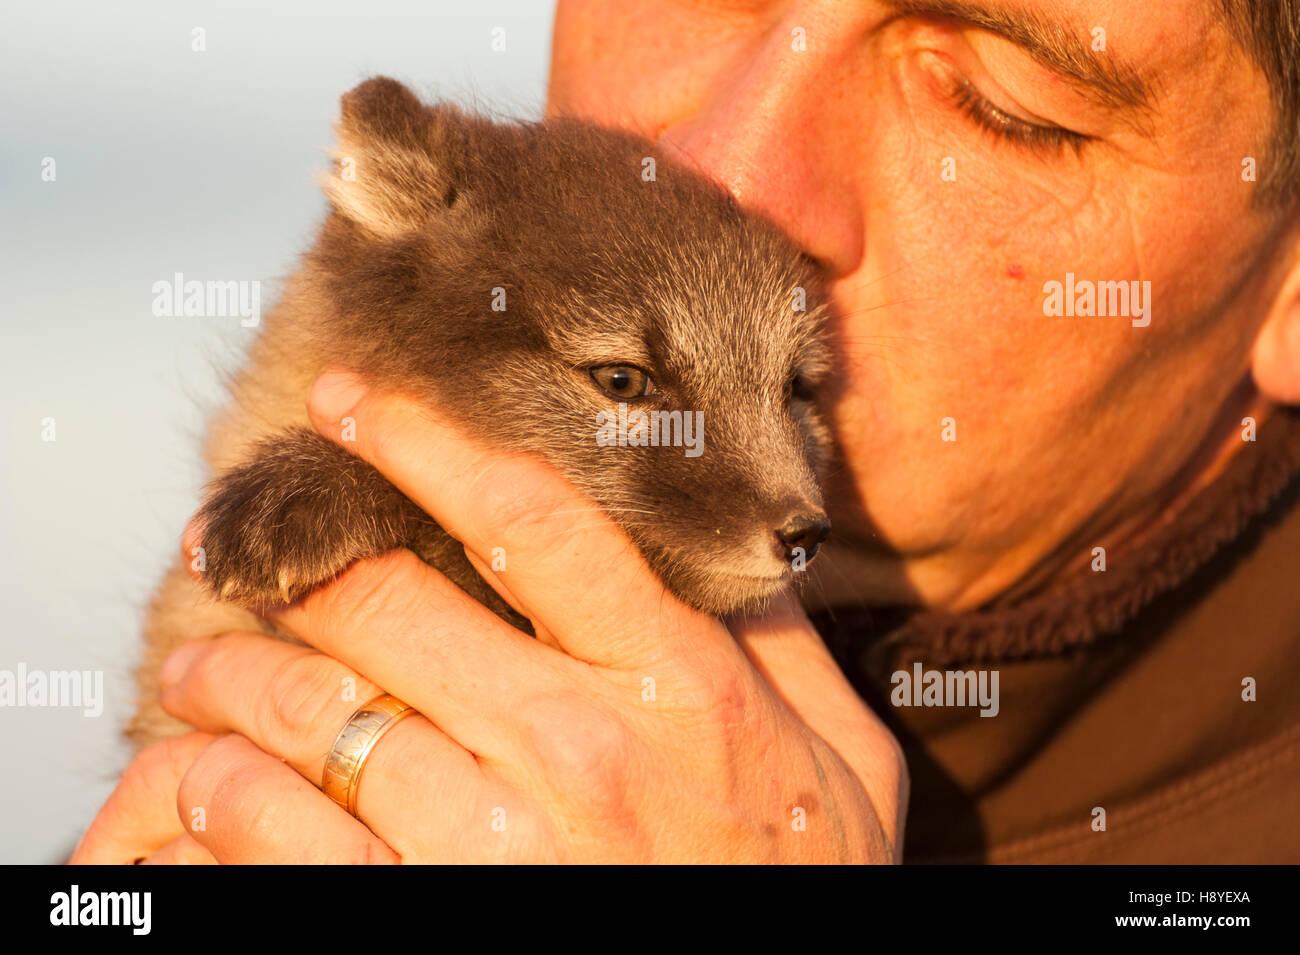 a-man-holding-an-arctic-fox-vulpes-lagopus-pup-H8YEXA.jpg